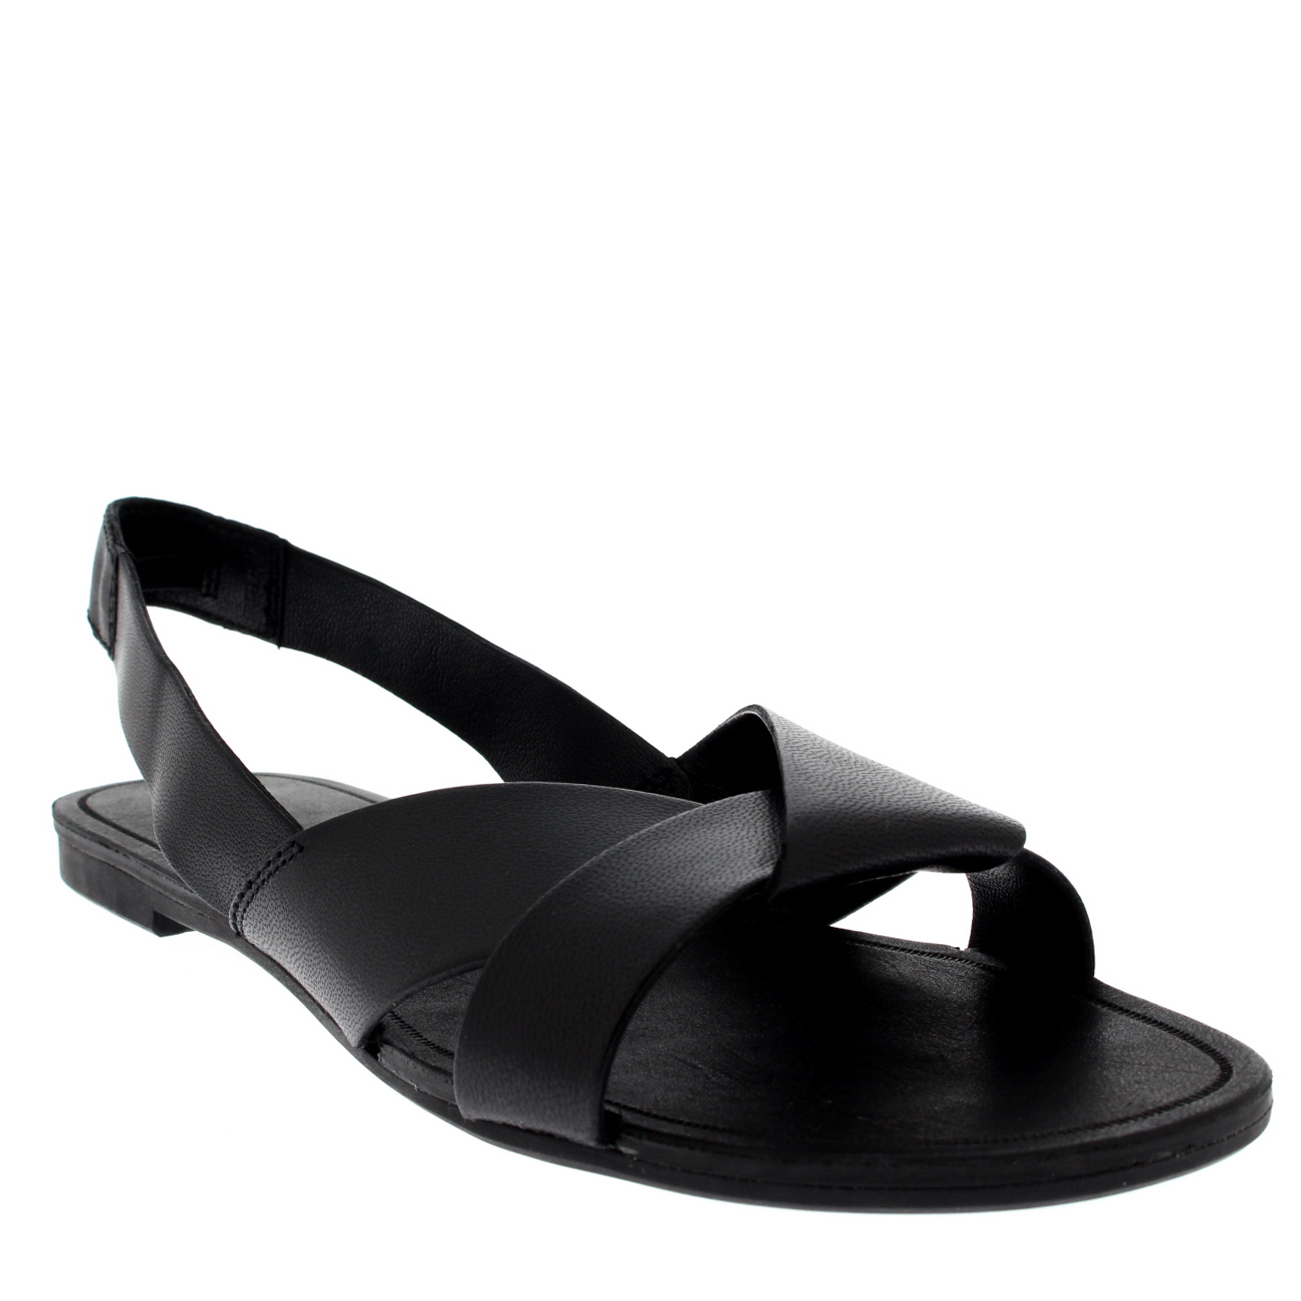 Black sandals uk - Womens Vagabond Tia Slingback Leather Black Open Toe Fashion Sandals Uk 3 9